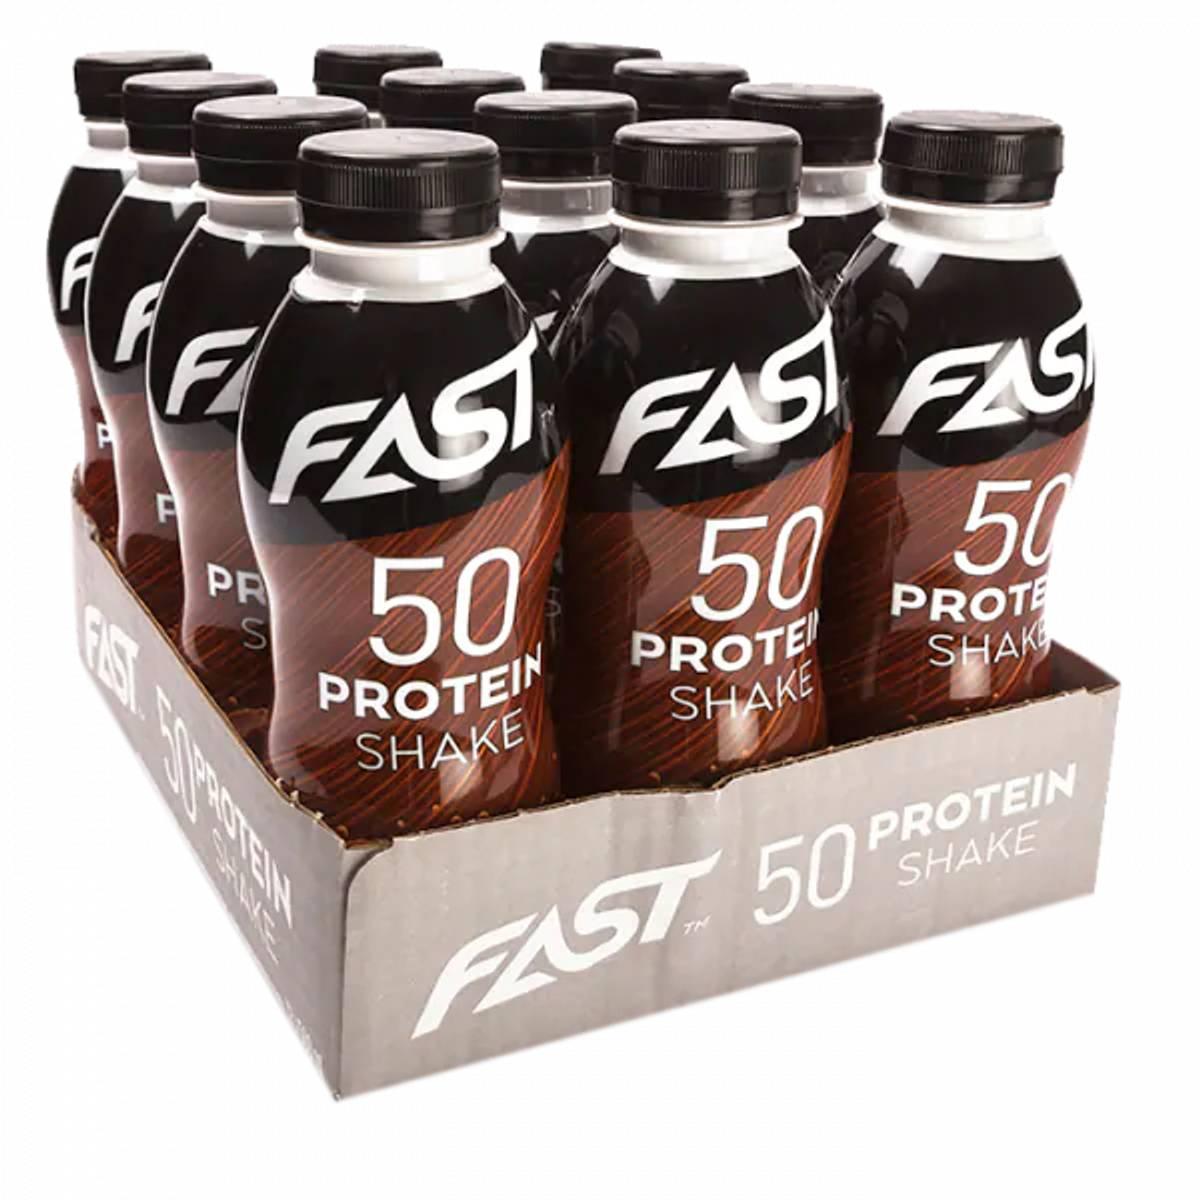 FAST Protein 50 shake - 500ml x 12stk - Chocolate